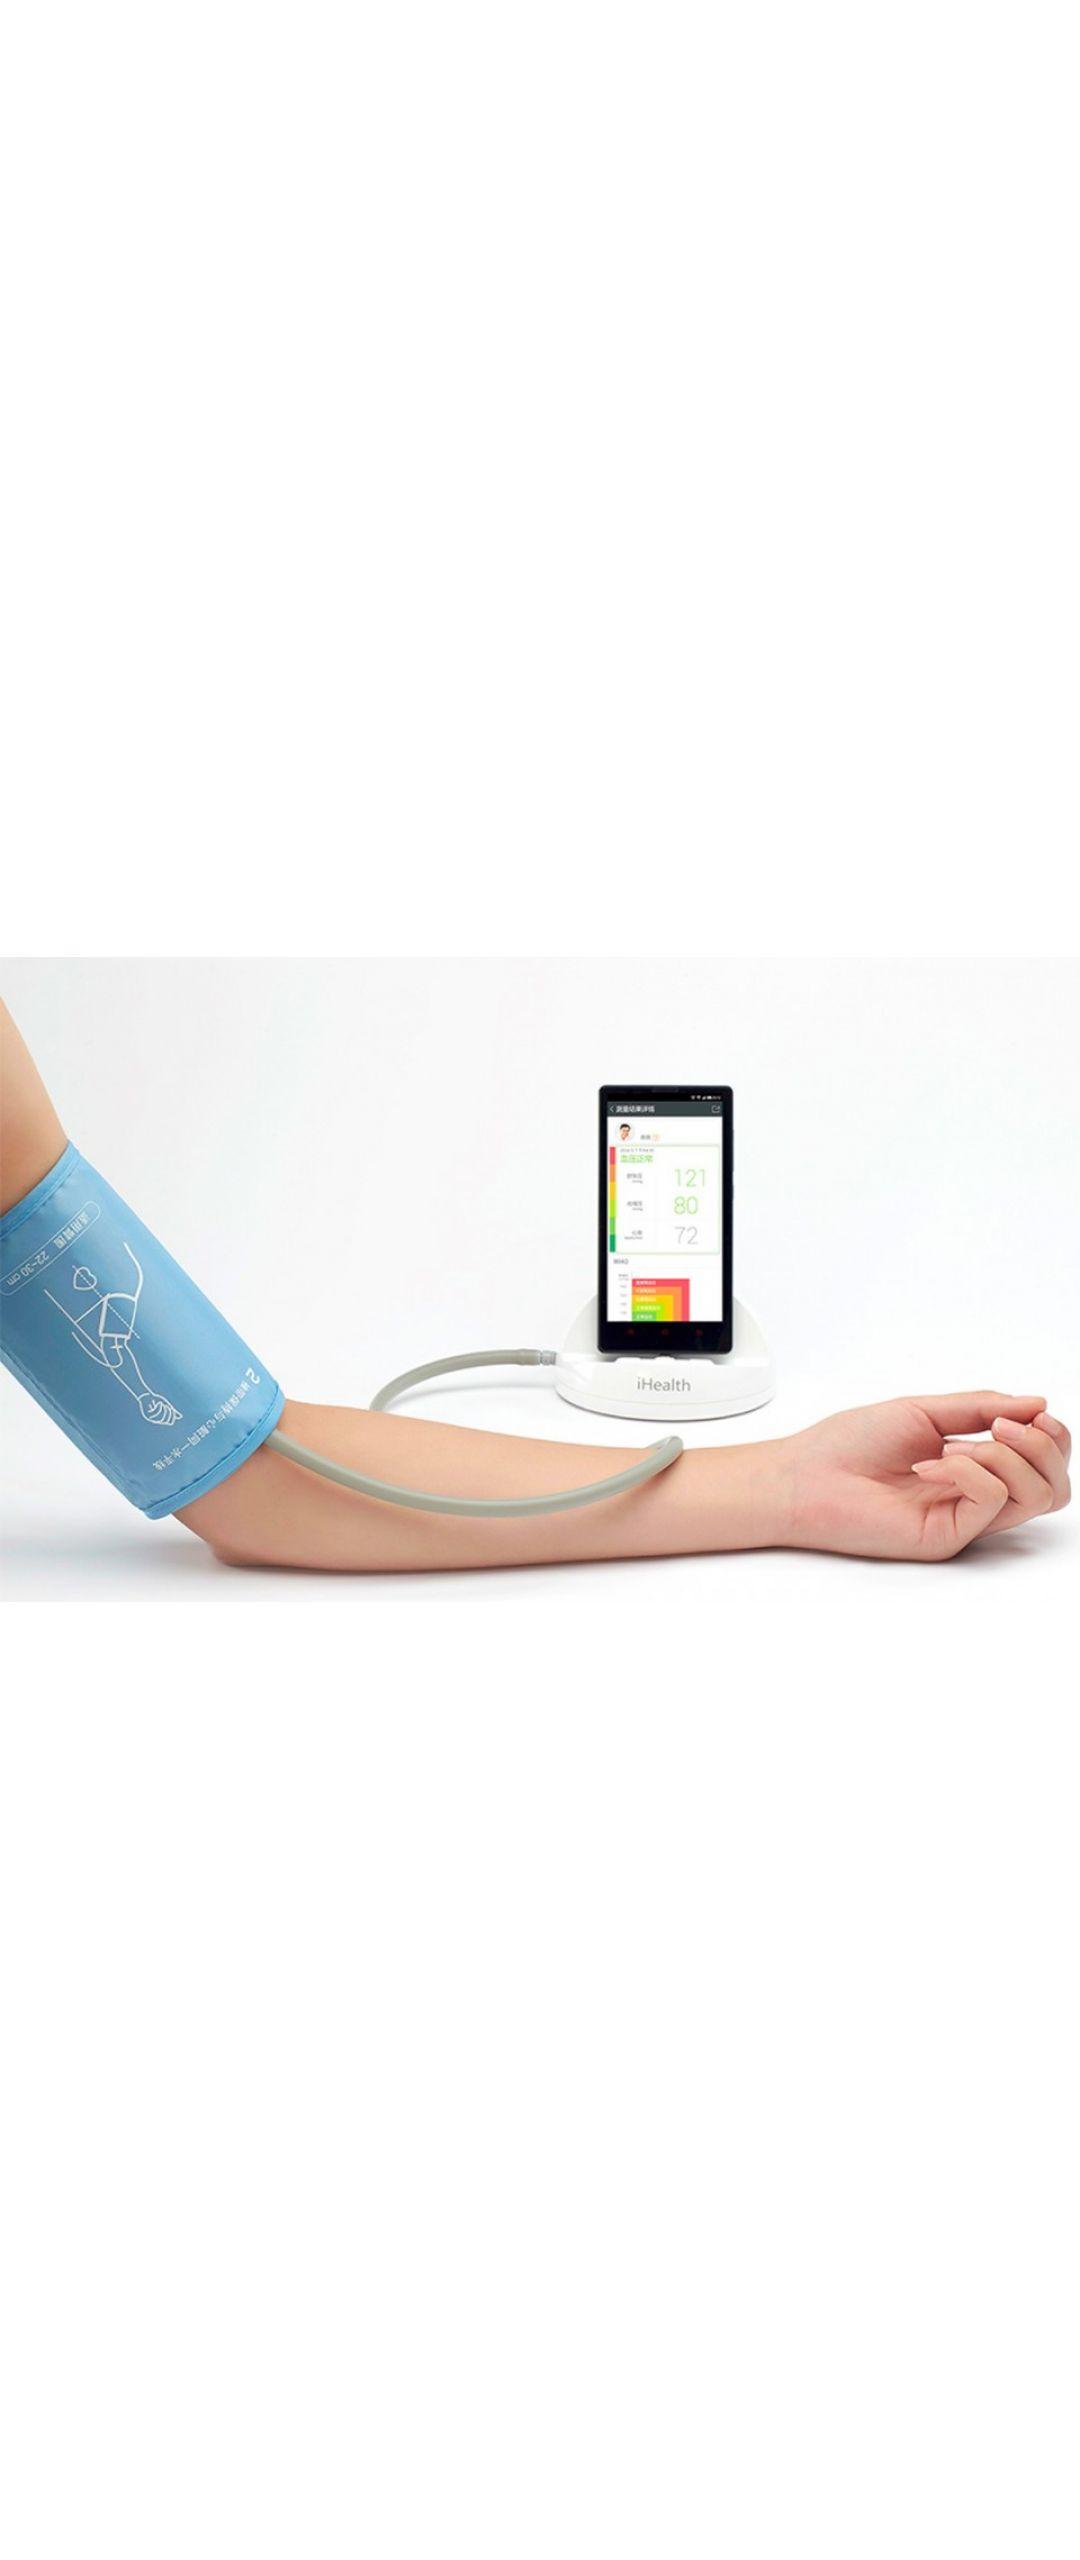 Comprueban que datos de dispositivos vestibles sirven para prevenir enfermedades